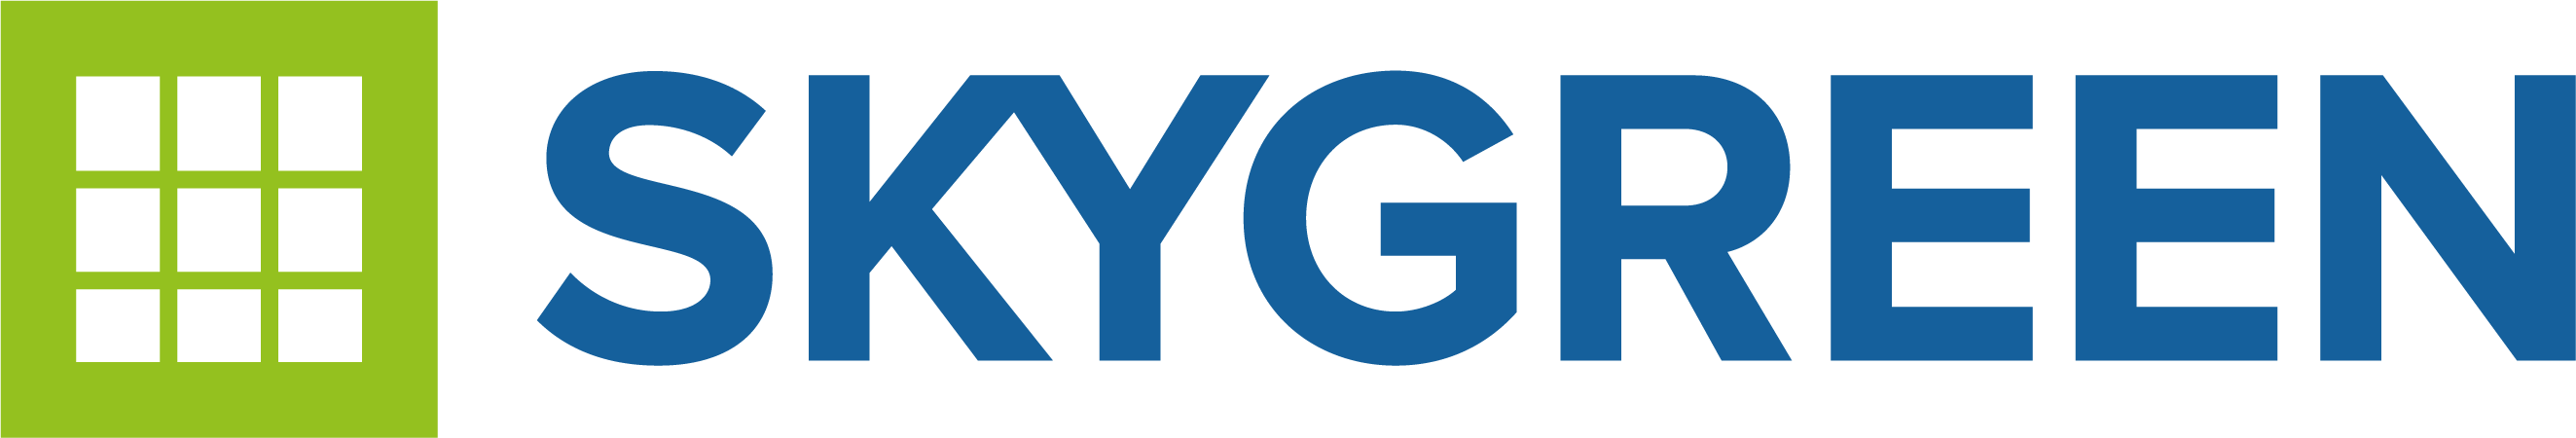 SkyGreen_logo_felirattal